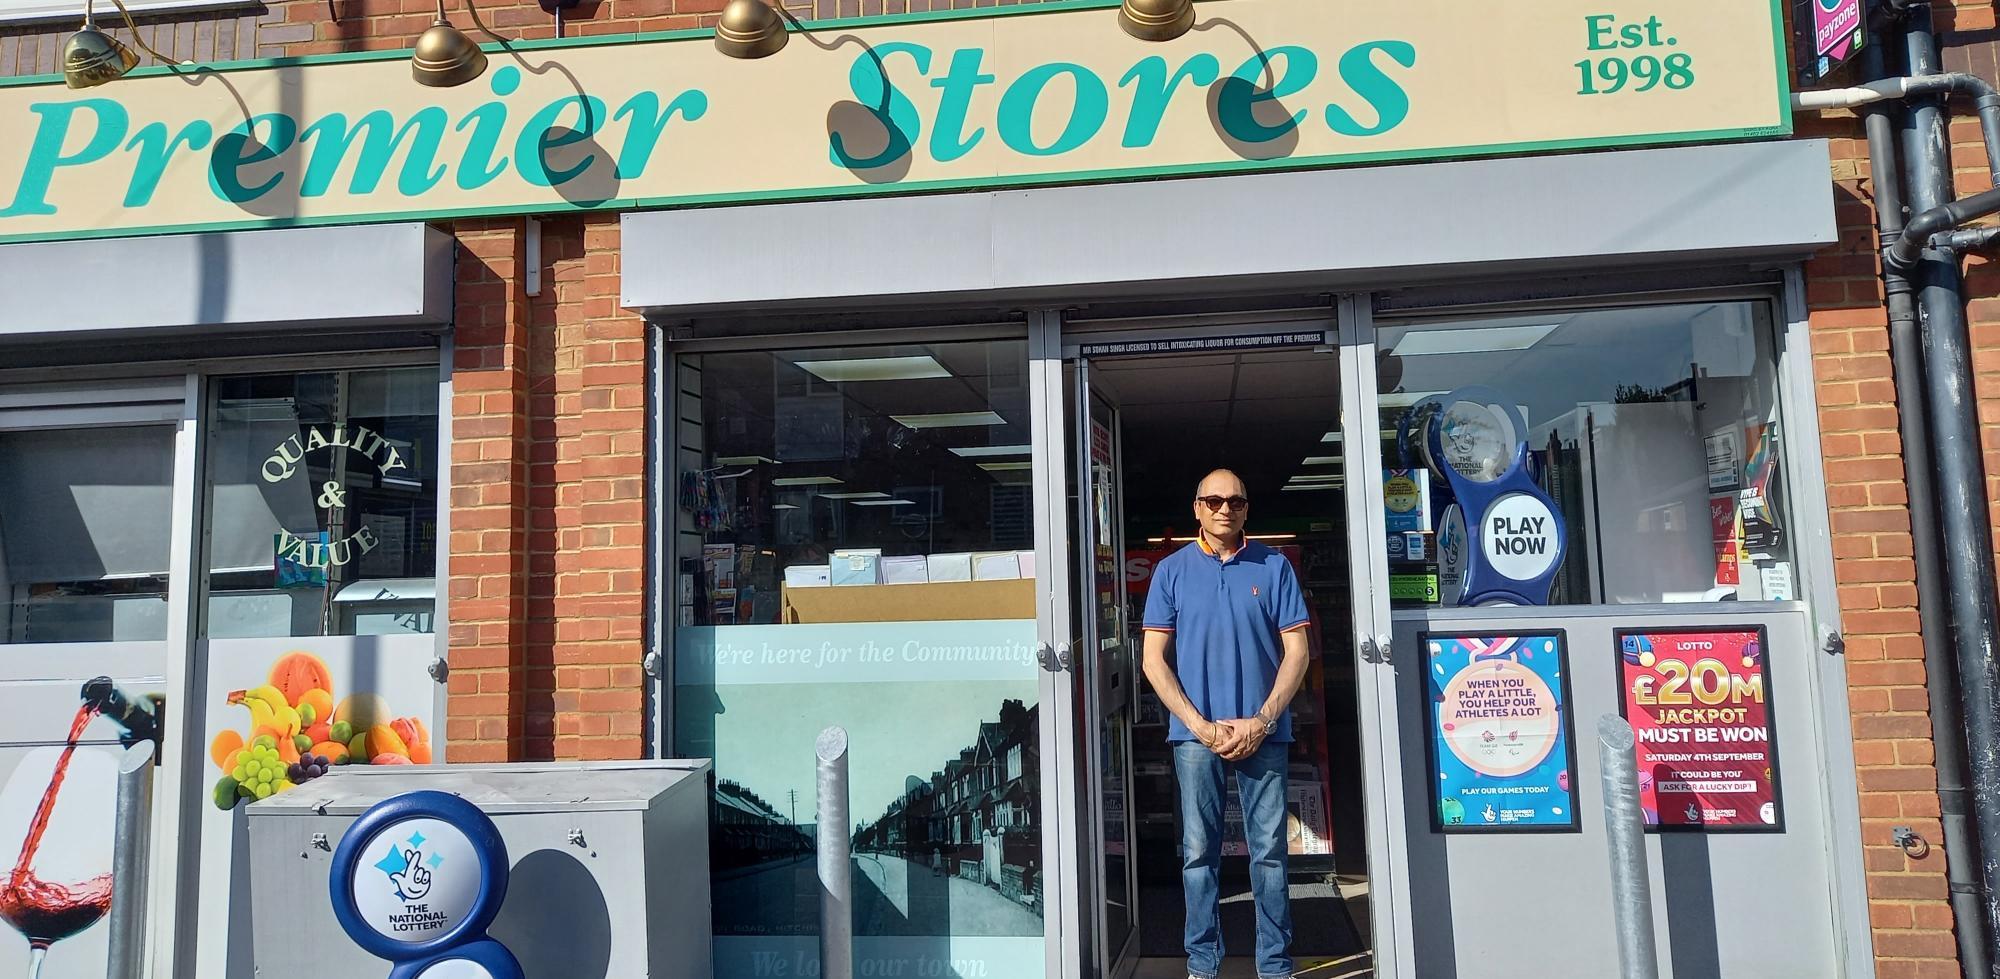 Sohan Singh from Premier Store in Hitchin in Hert